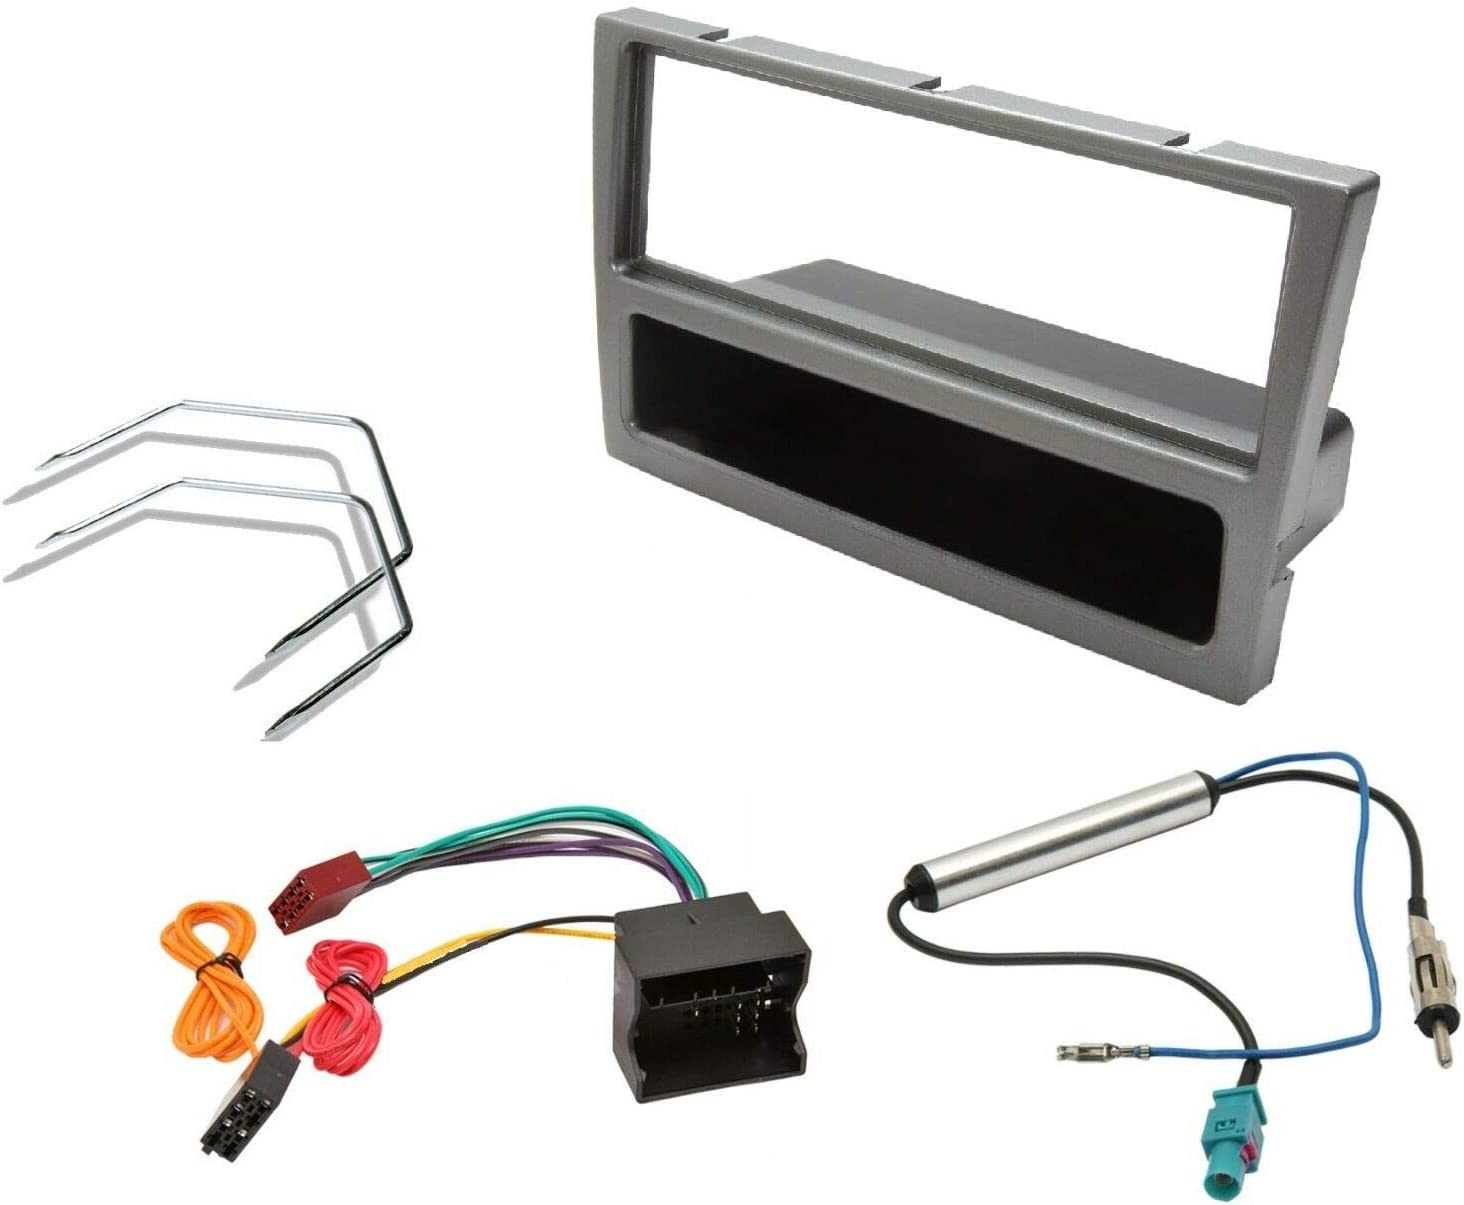 Inex Vauxhall Gunmetal Facia Fascia Fitting Kit Car CD Stereo Radio Quadlock Wiring